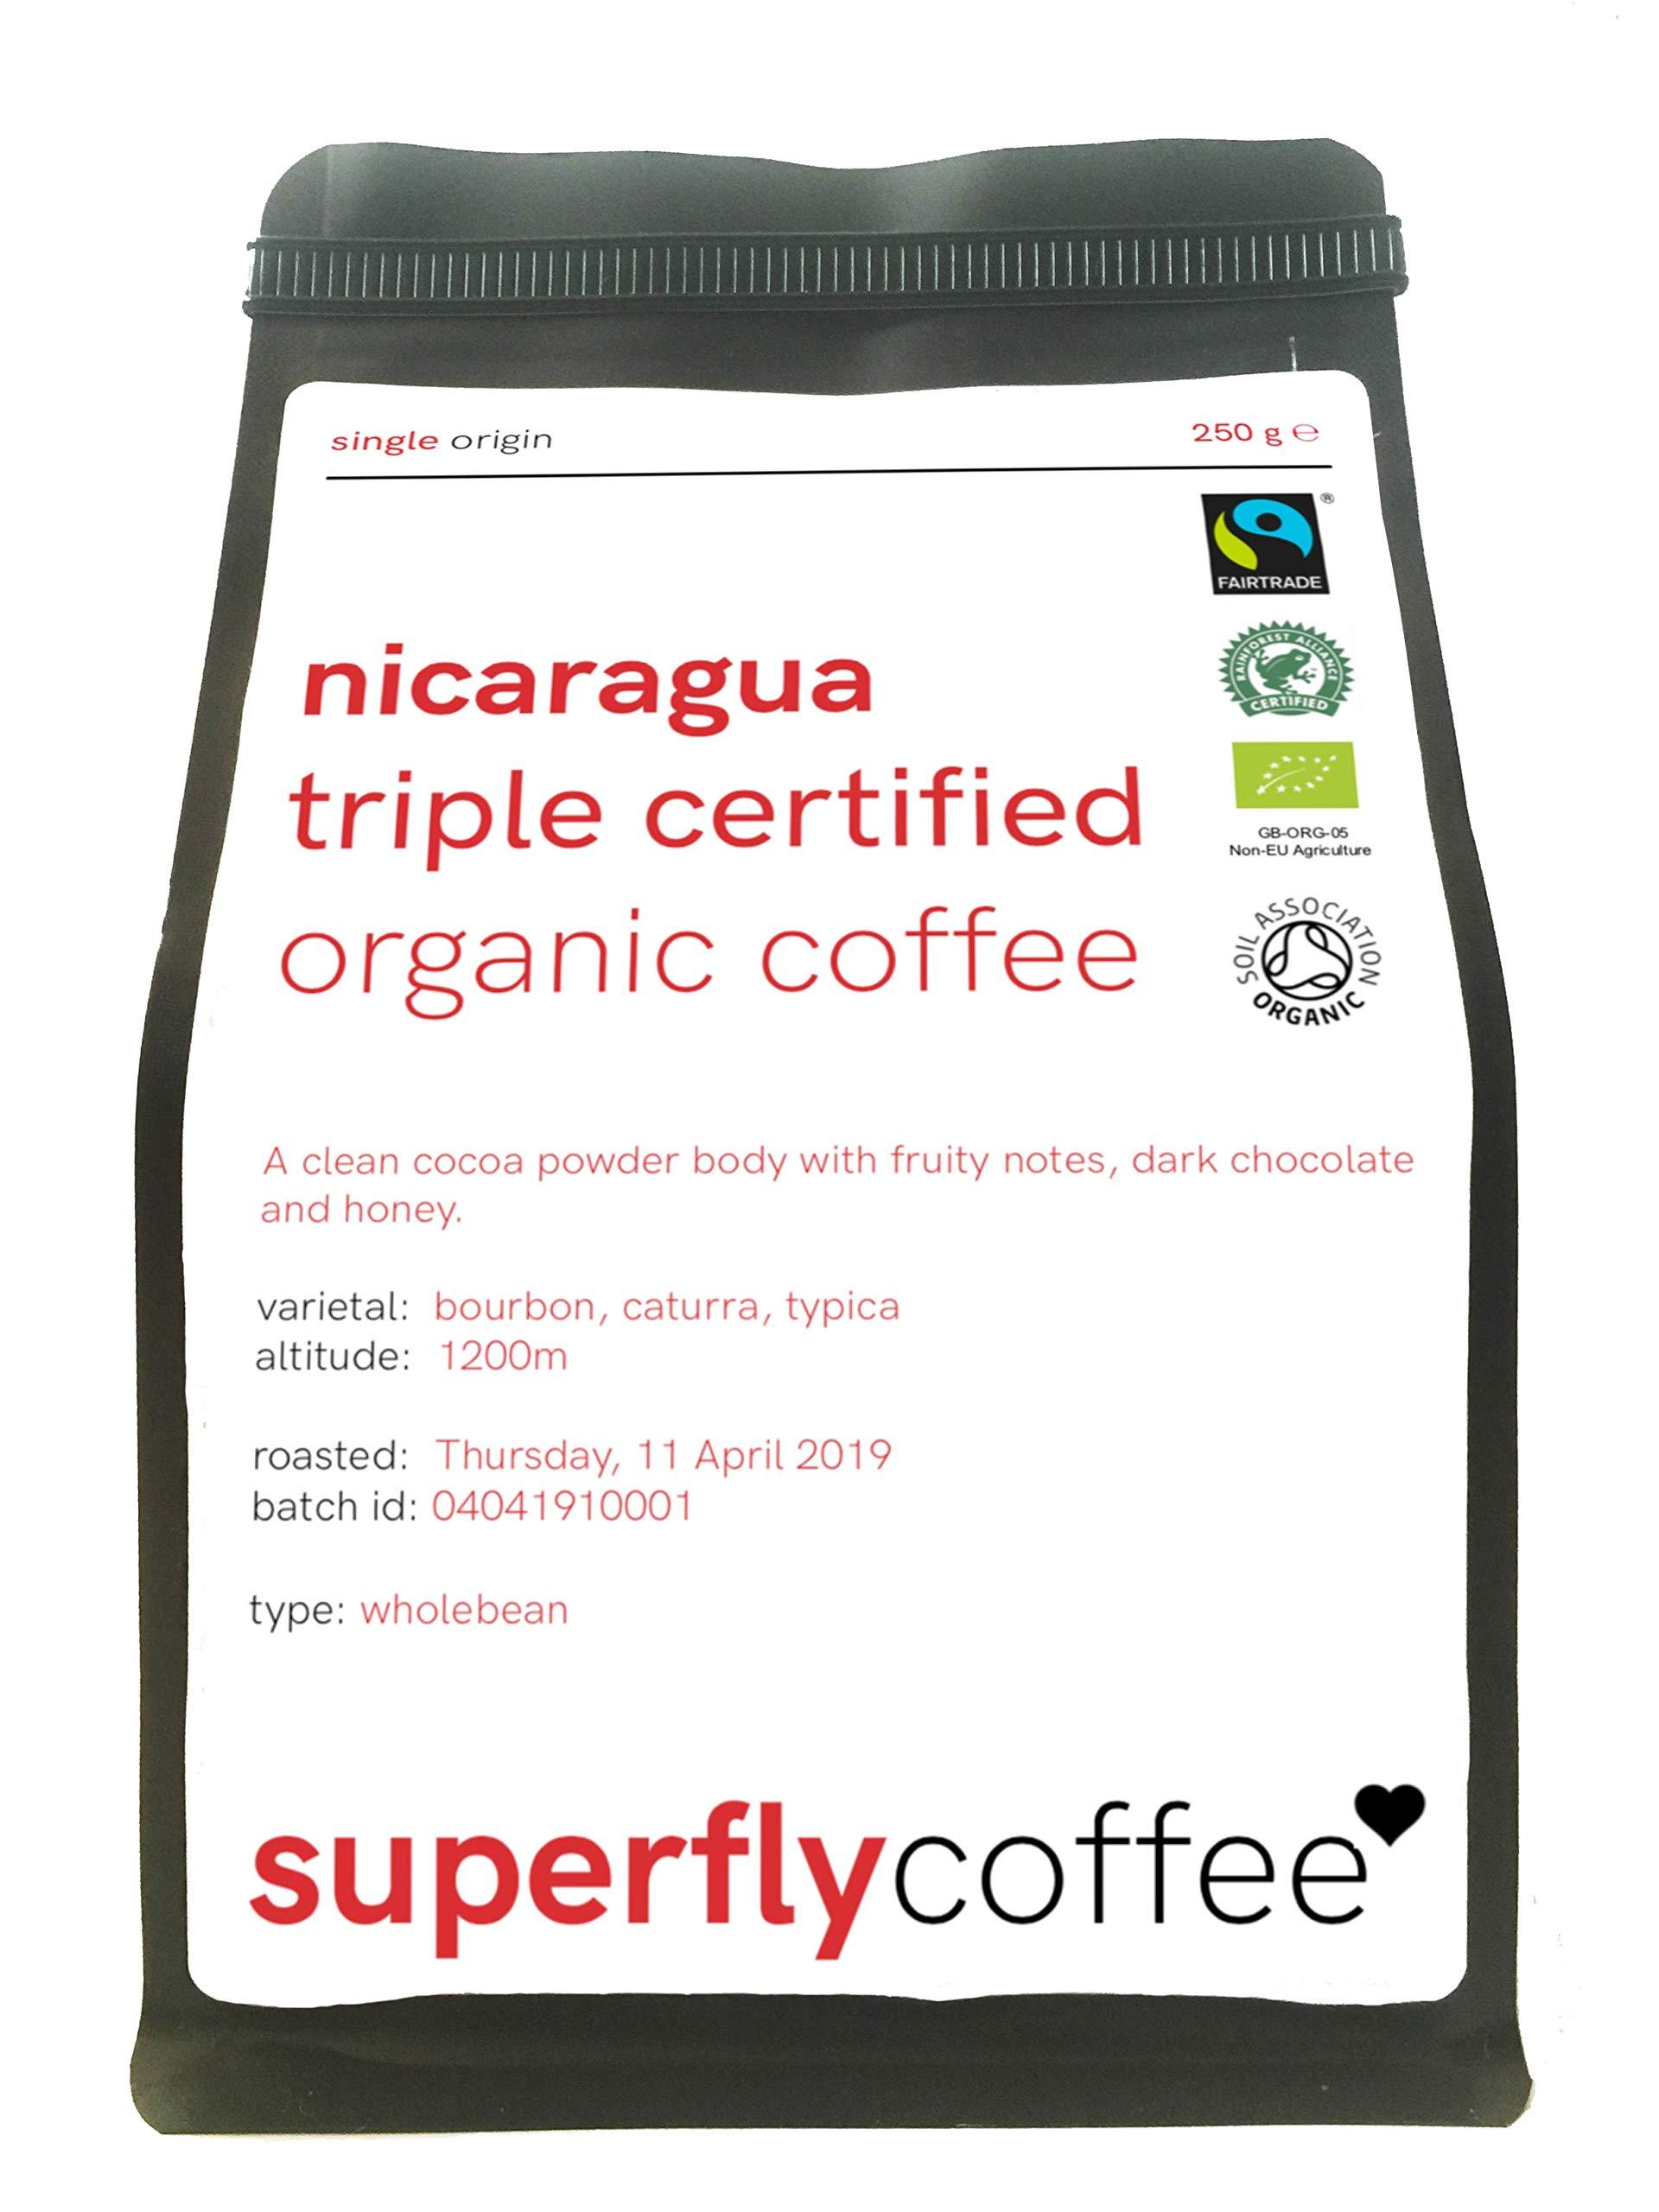 SUPERFLY – Nicaraguan Triple Certified Organic Bulletproof Coffee | 250g Ground | Single Origin Arabica | Fairtrade & Rainforest Alliance Nicaraguan Coffee